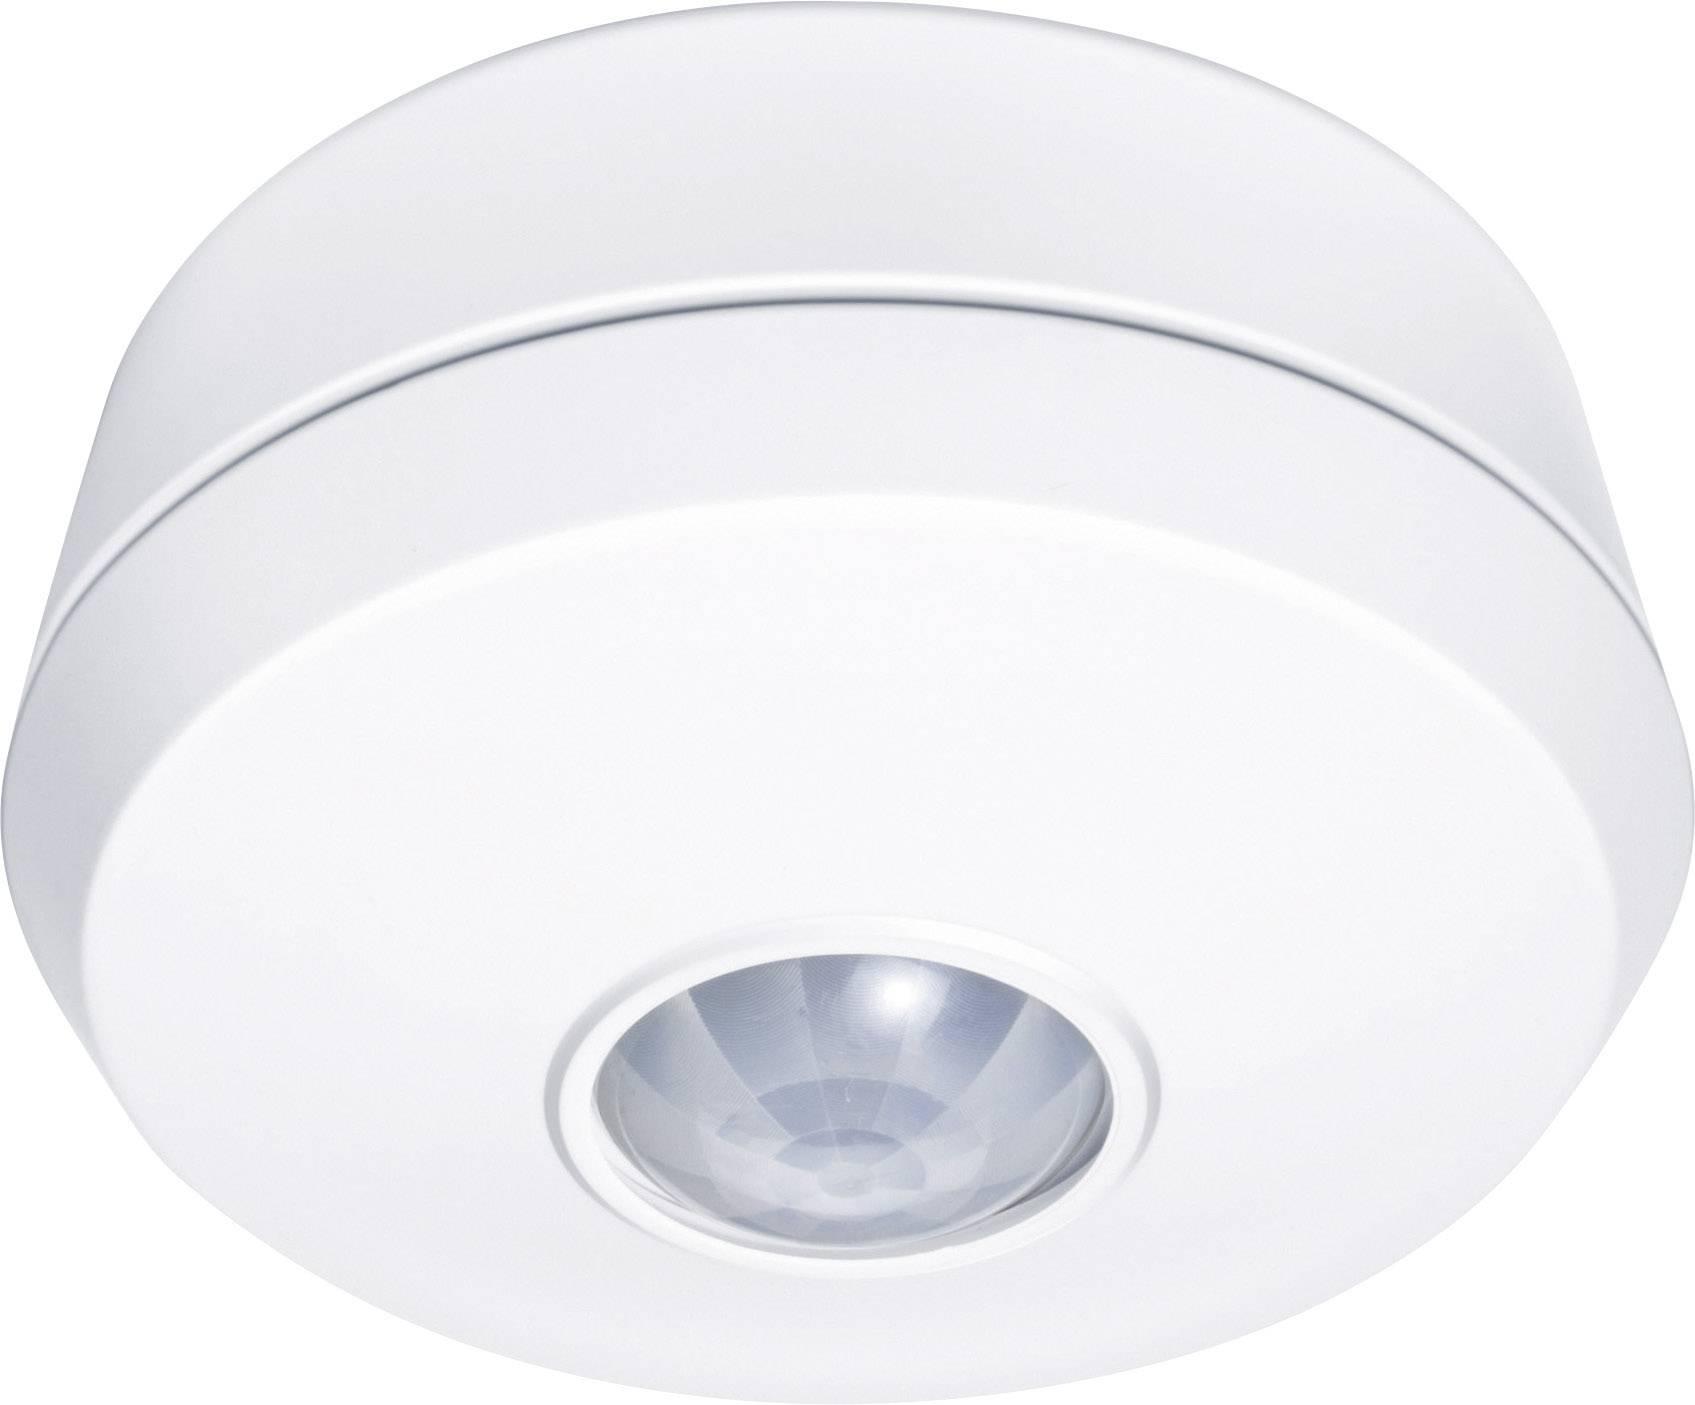 Senzor pohybu PIR GEV 018709, 360 °, relé, biela, IP20